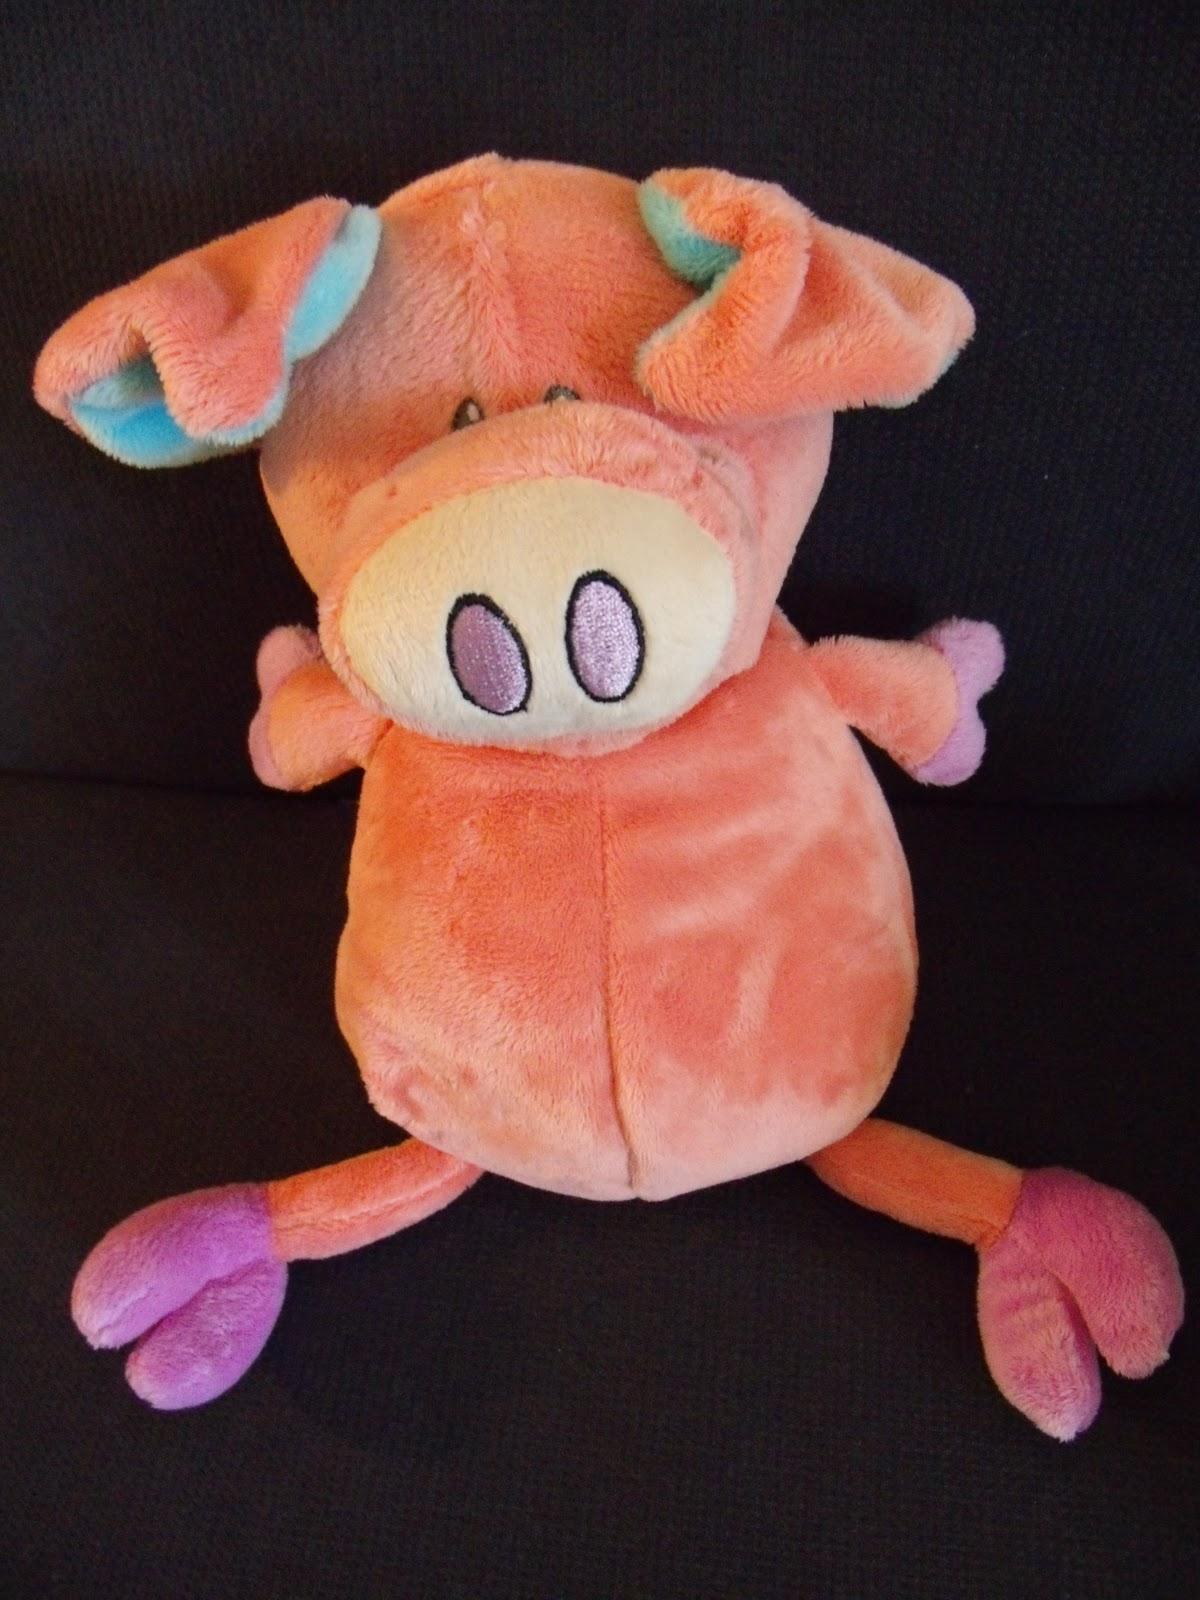 stuffed animals, plush, nuby